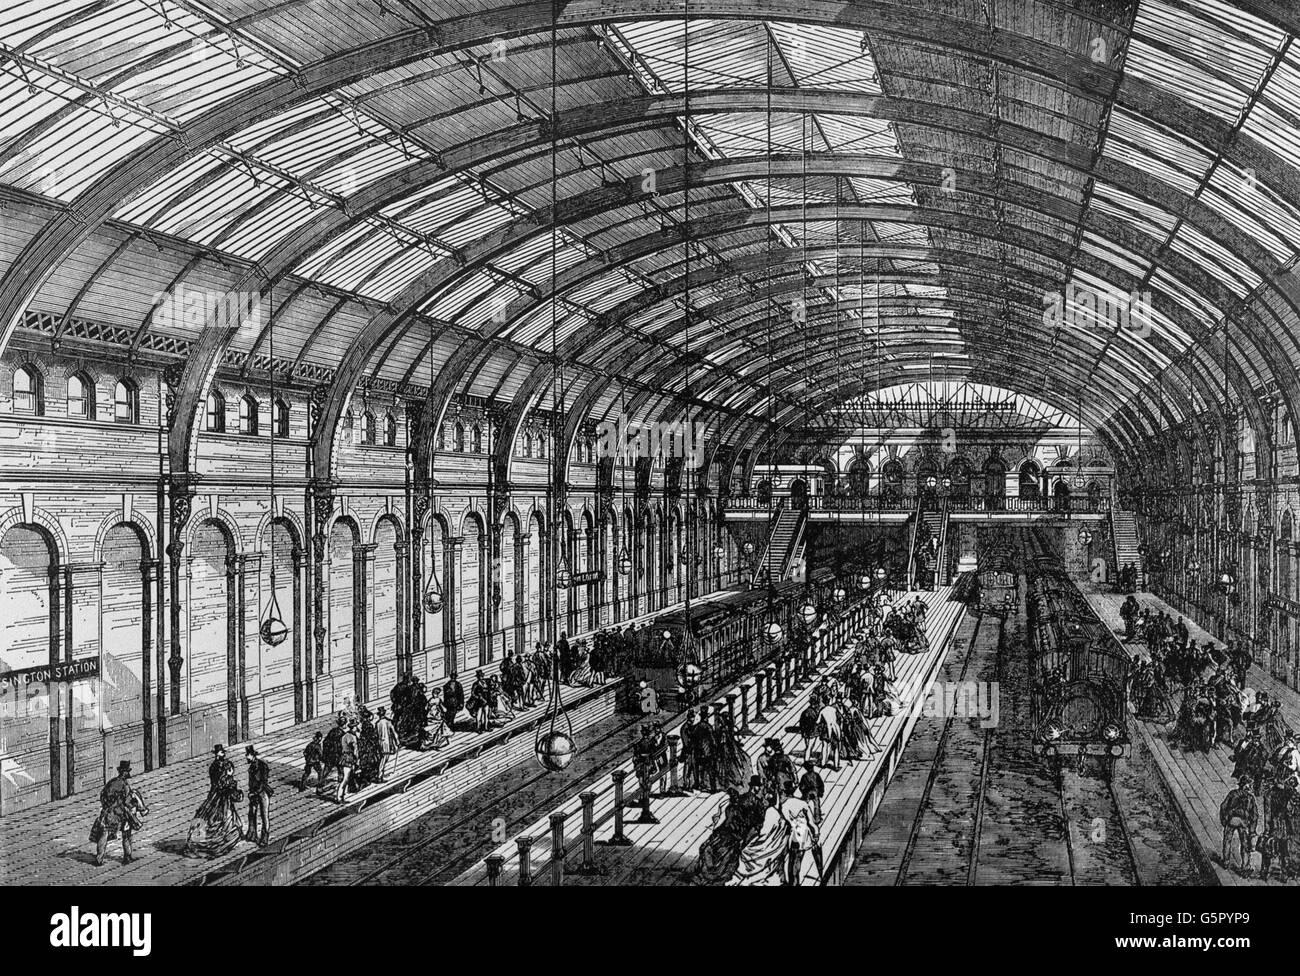 Transport - London Underground - Notting Hill Gate Tube Station - Stock Image